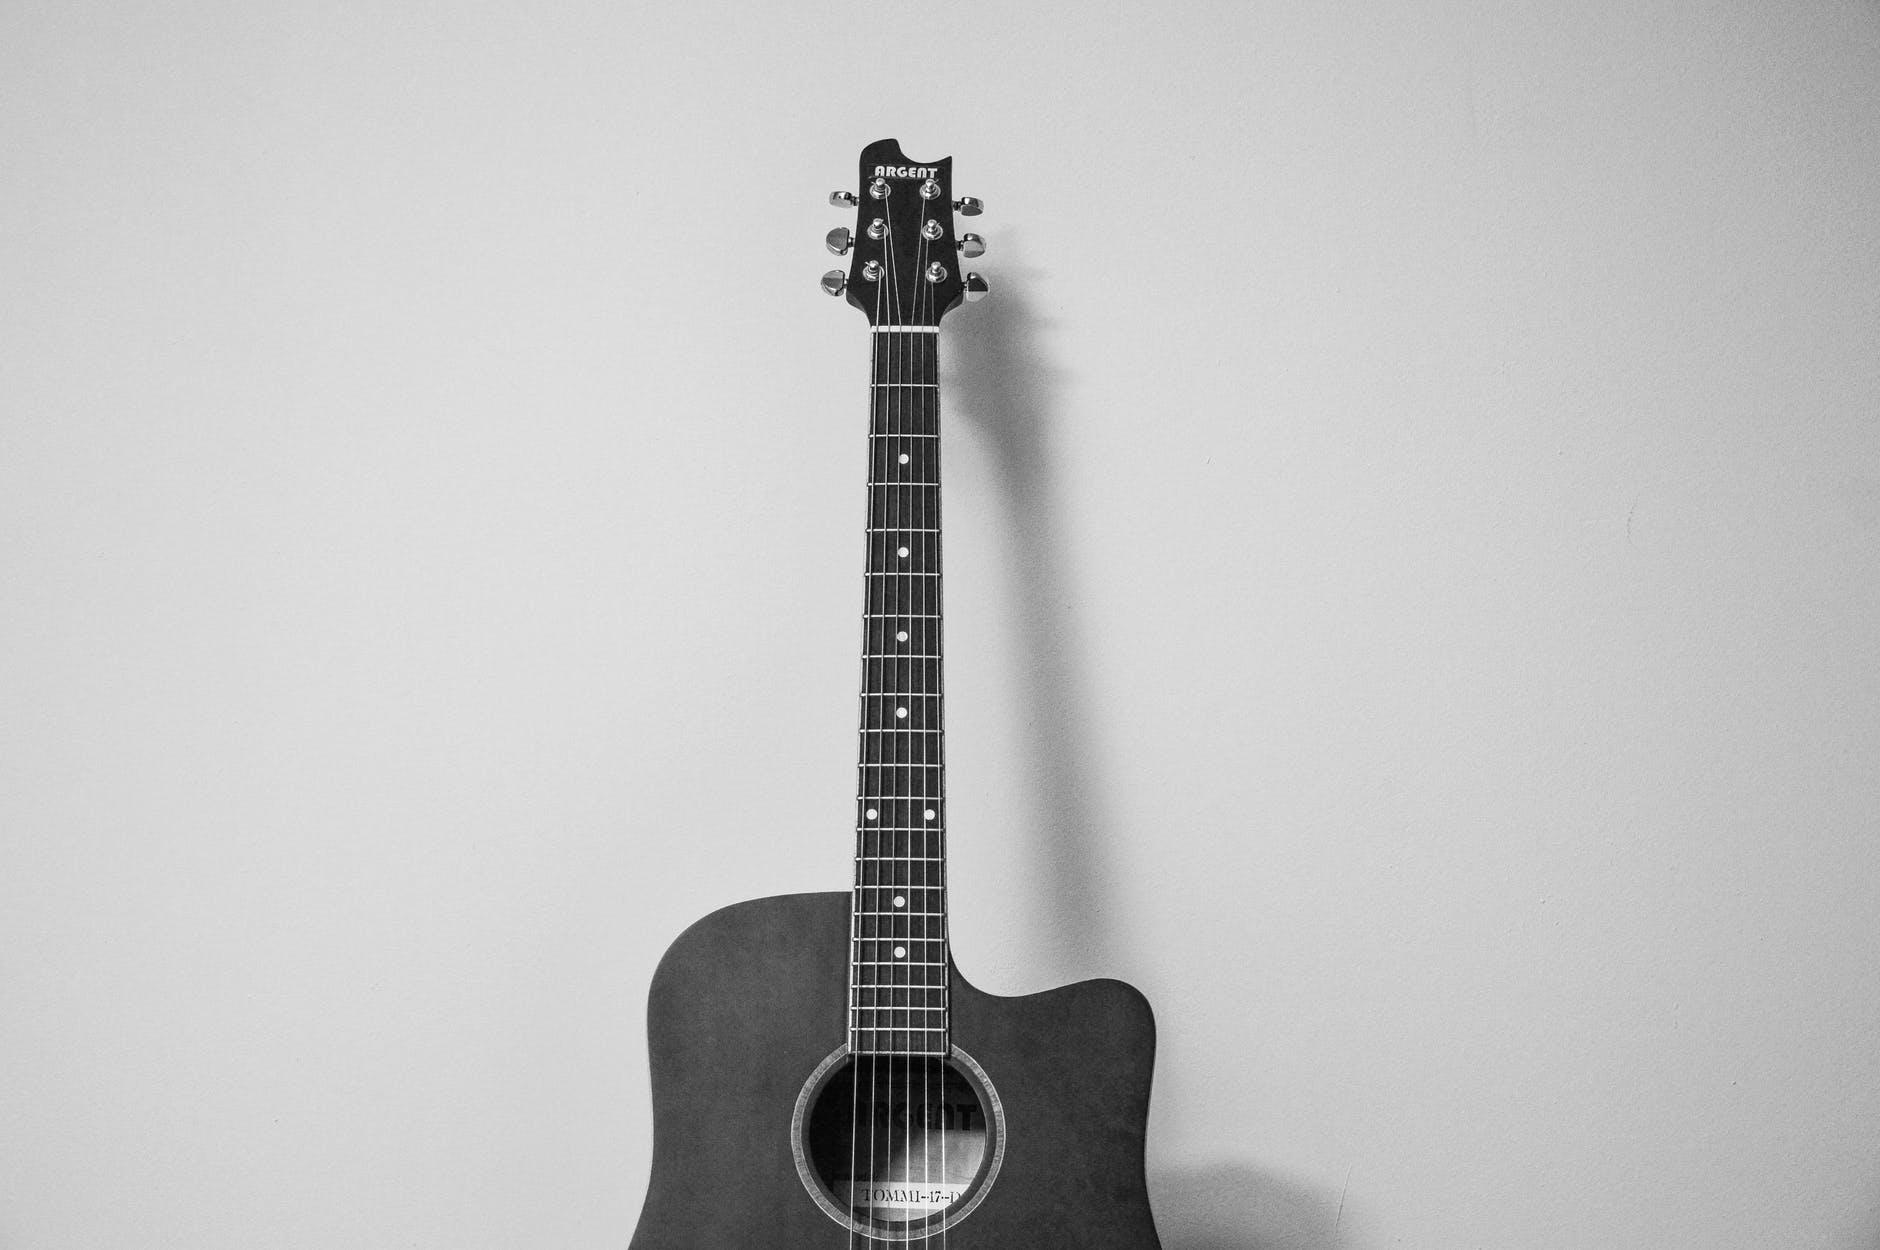 A guitar lying against a blank wall